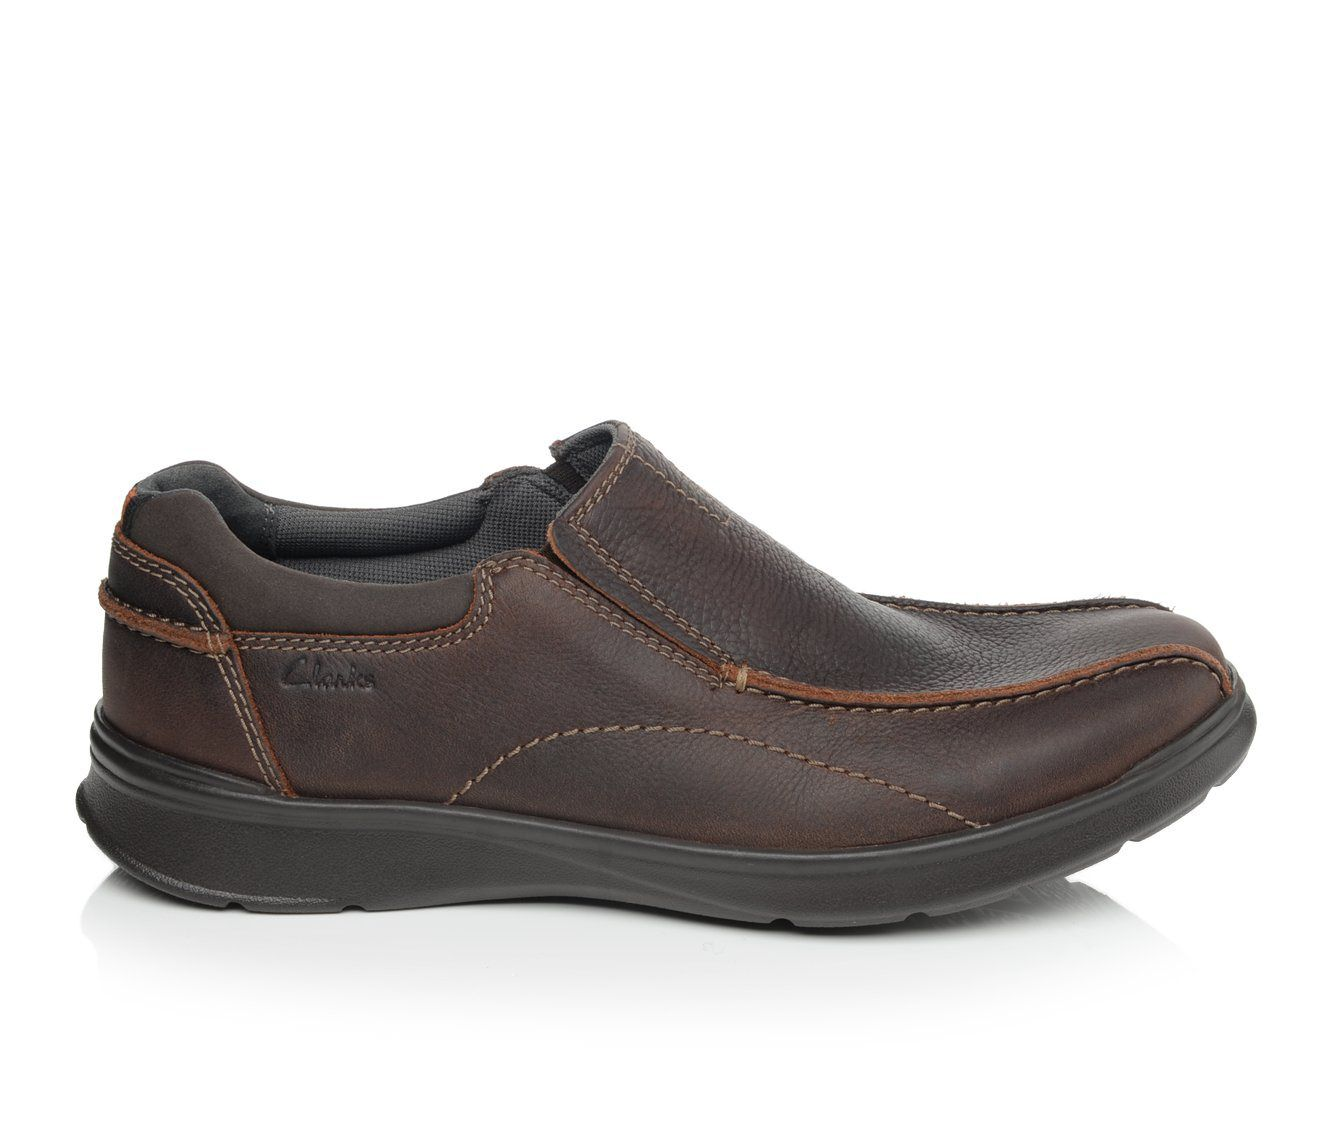 Men's Clarks Cotrell Step Slip On Shoes